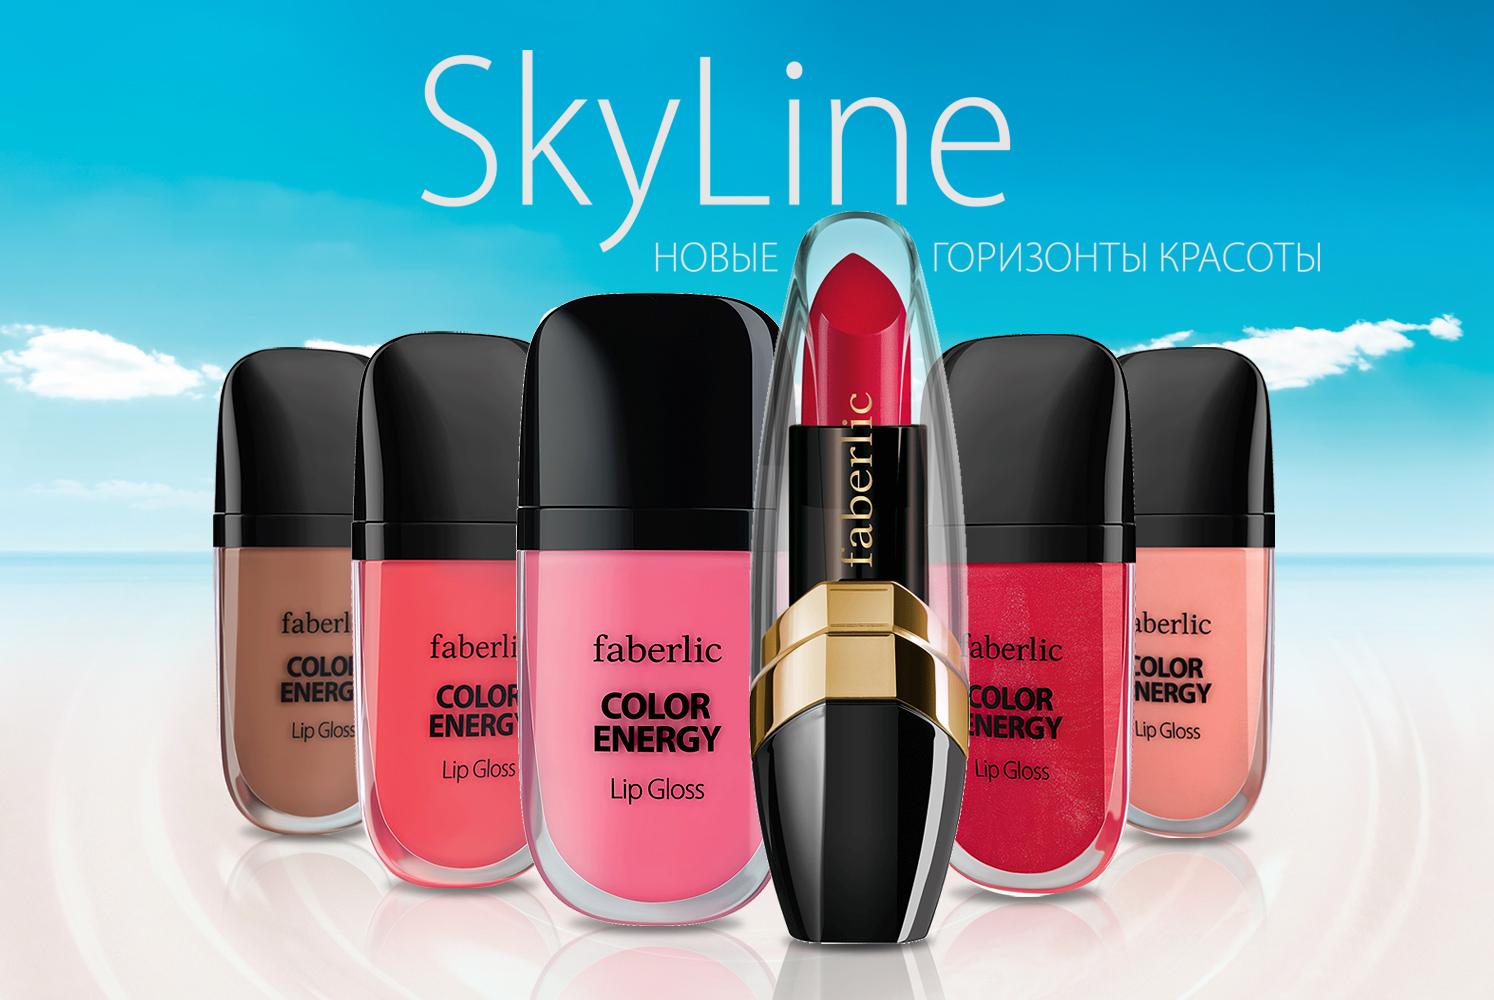 8-SkyLine-3-2016-action